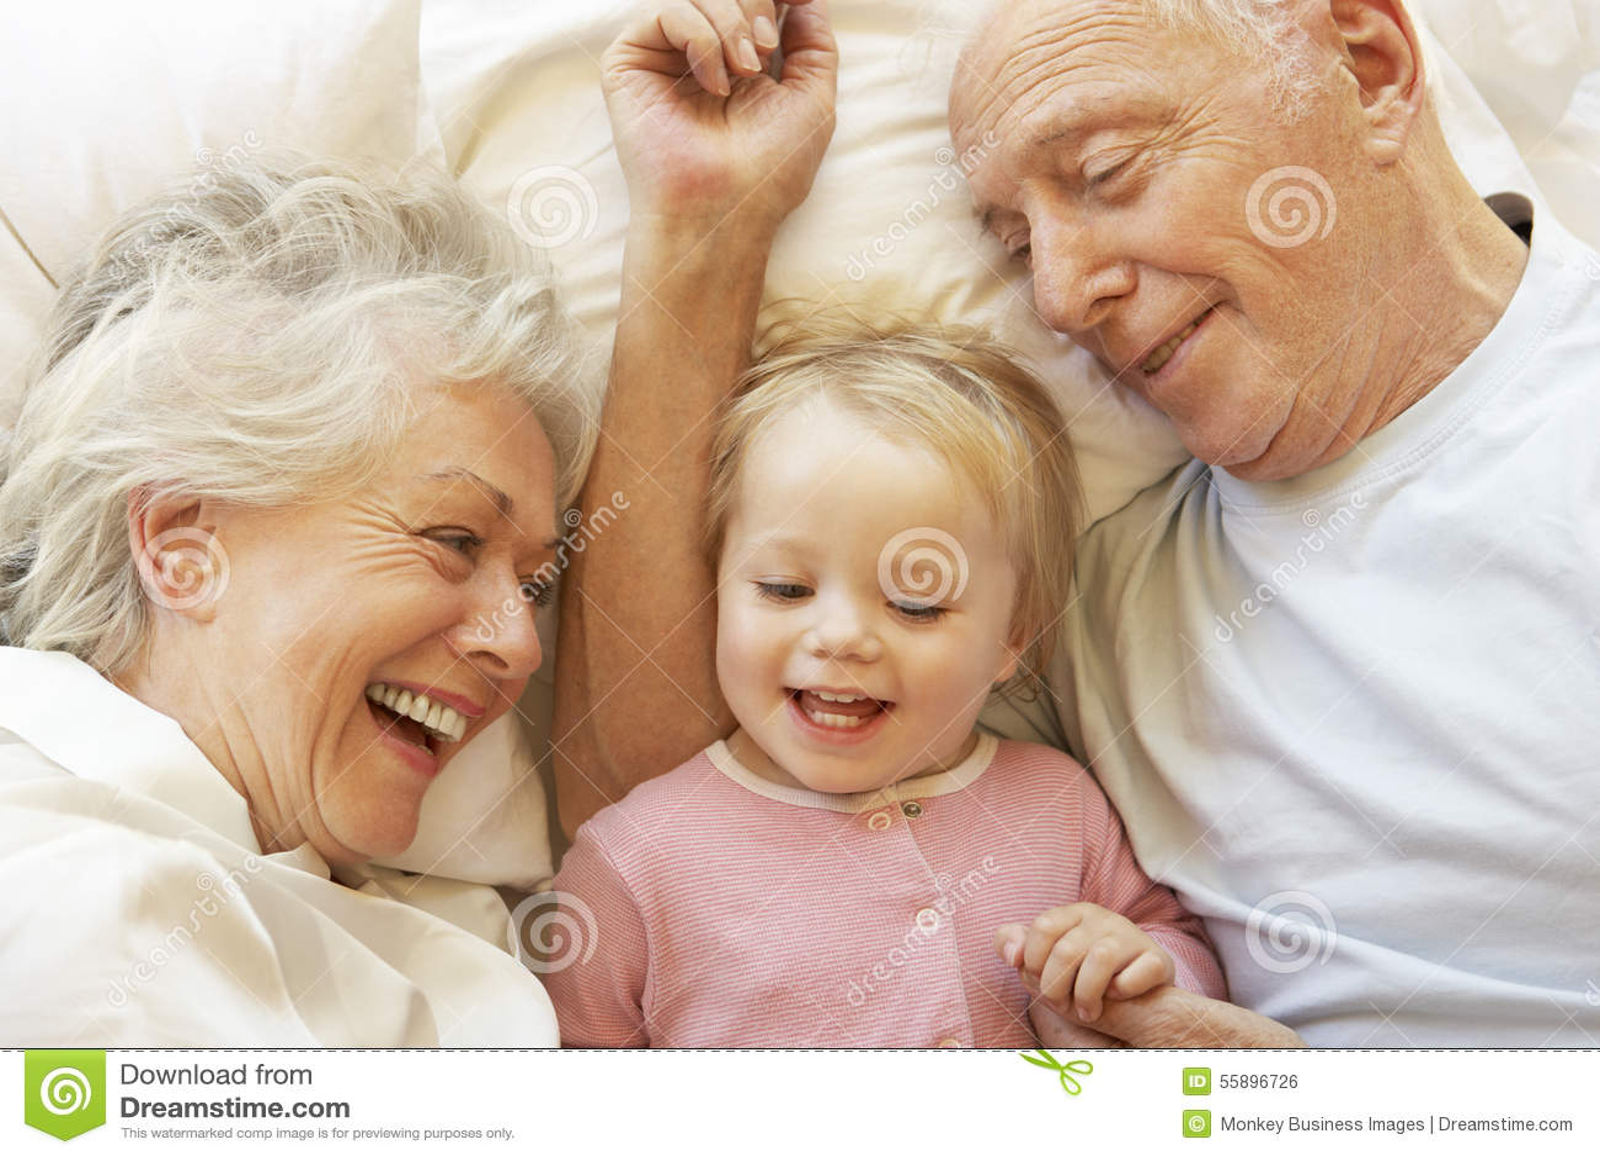 Grandparents Cuddling Granddaughter In Bed